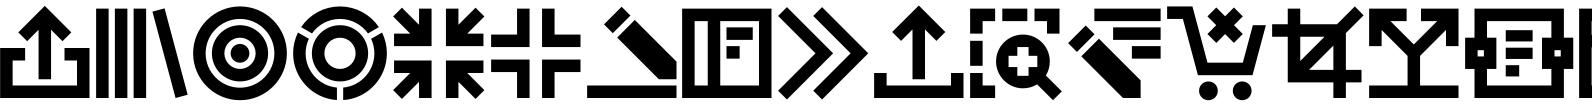 neue UXUI Icons